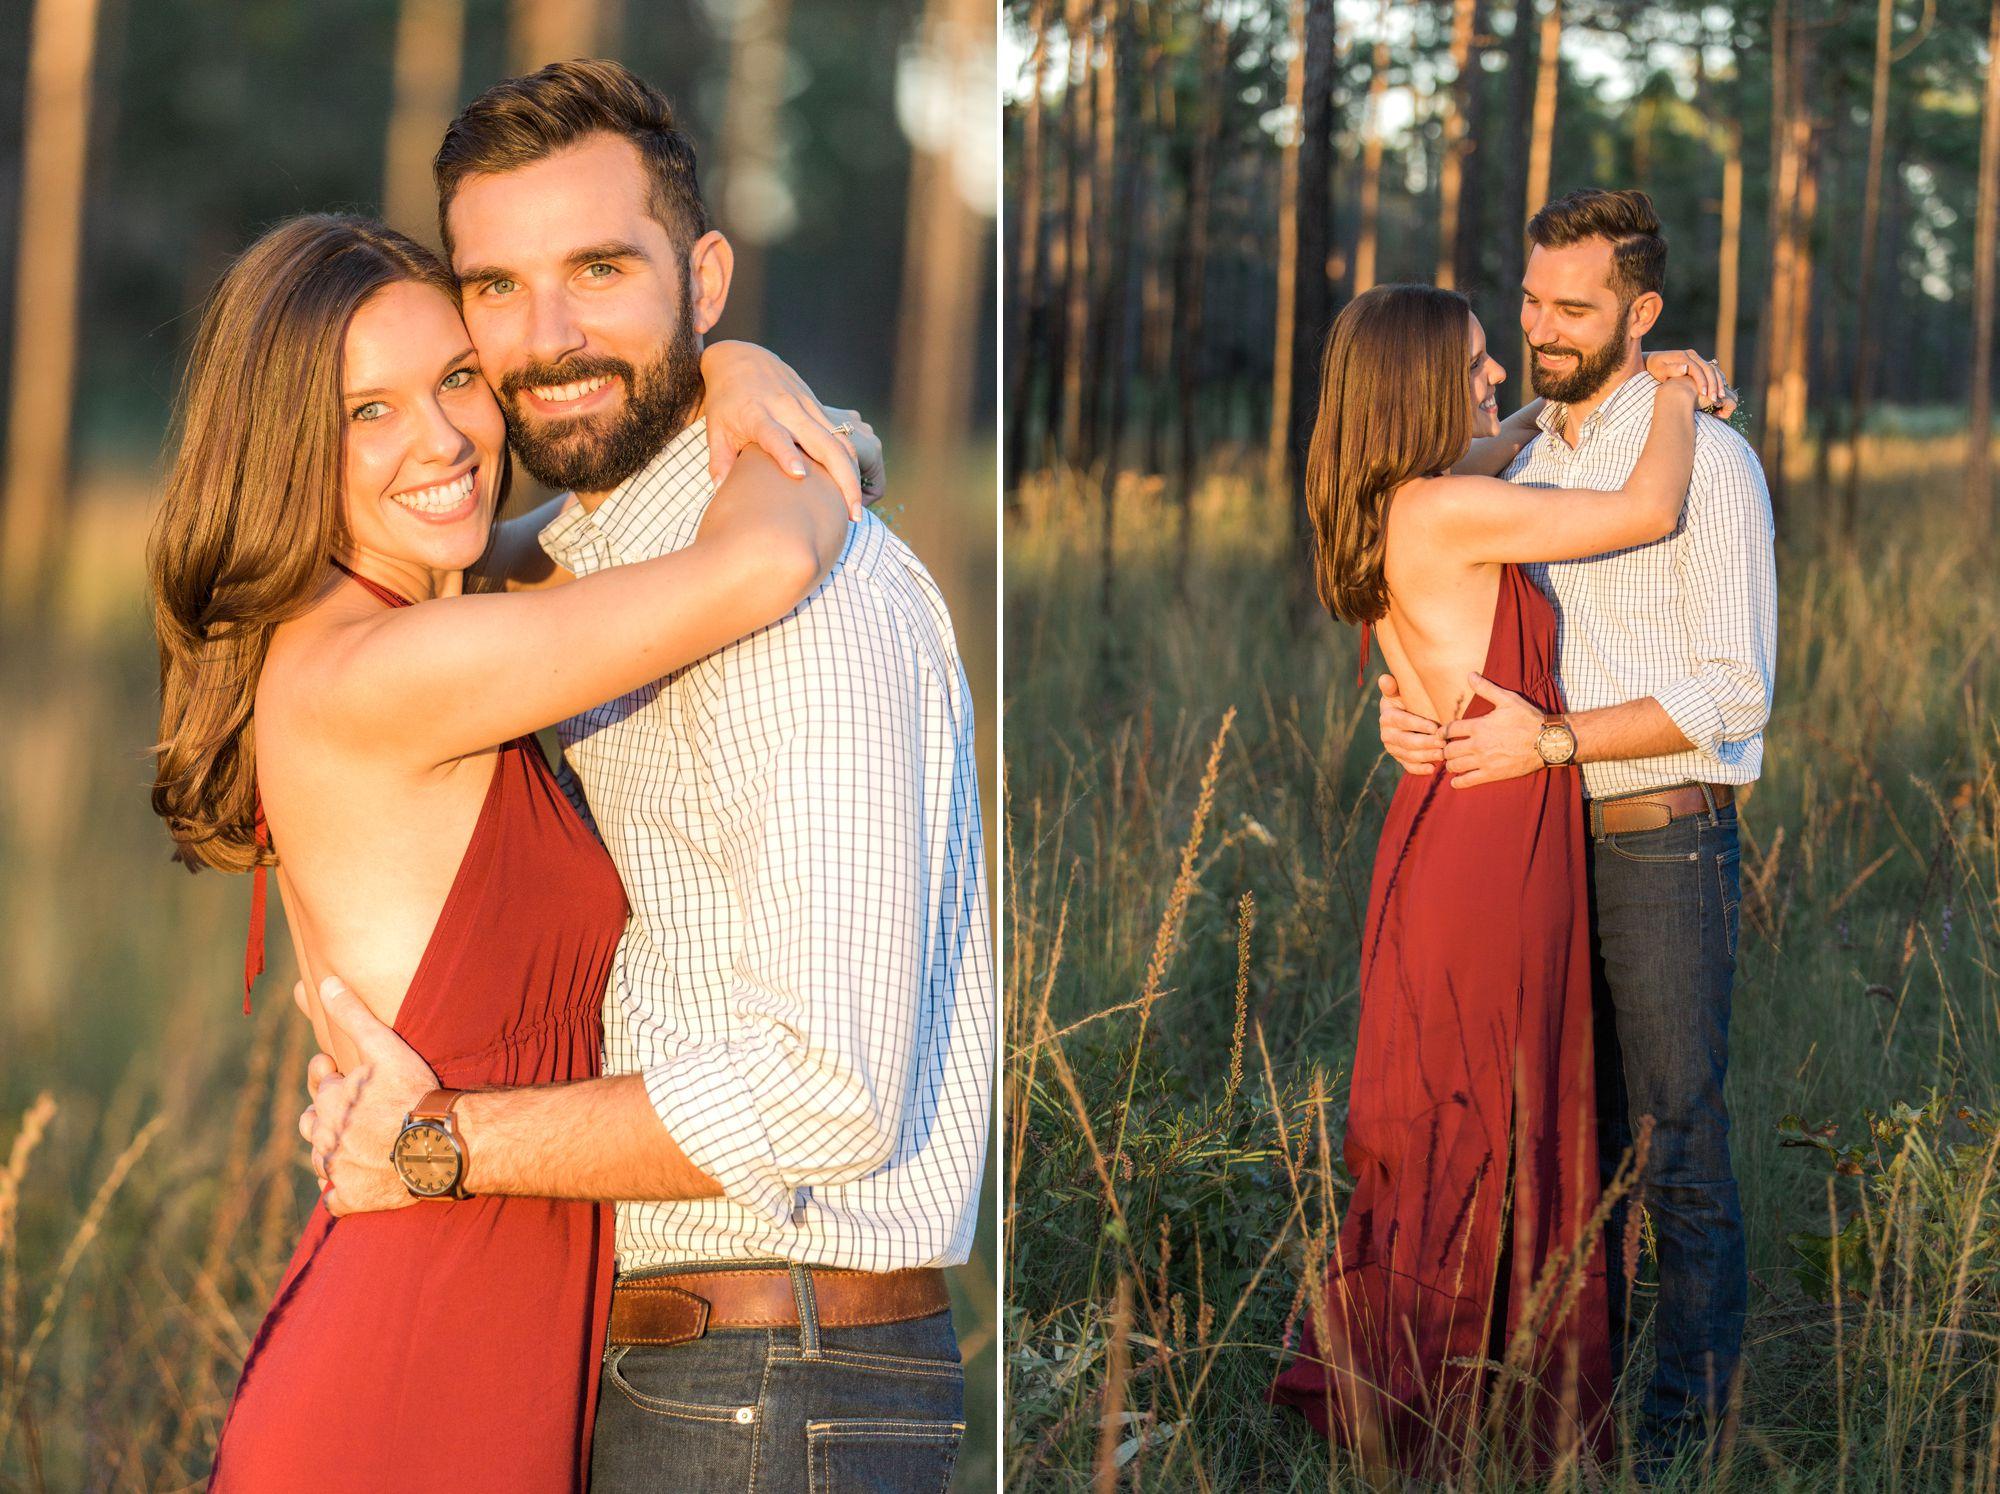 Romantic forest engagement couples photos in Orlando at Wekiva Springs via shainadeciryan.com